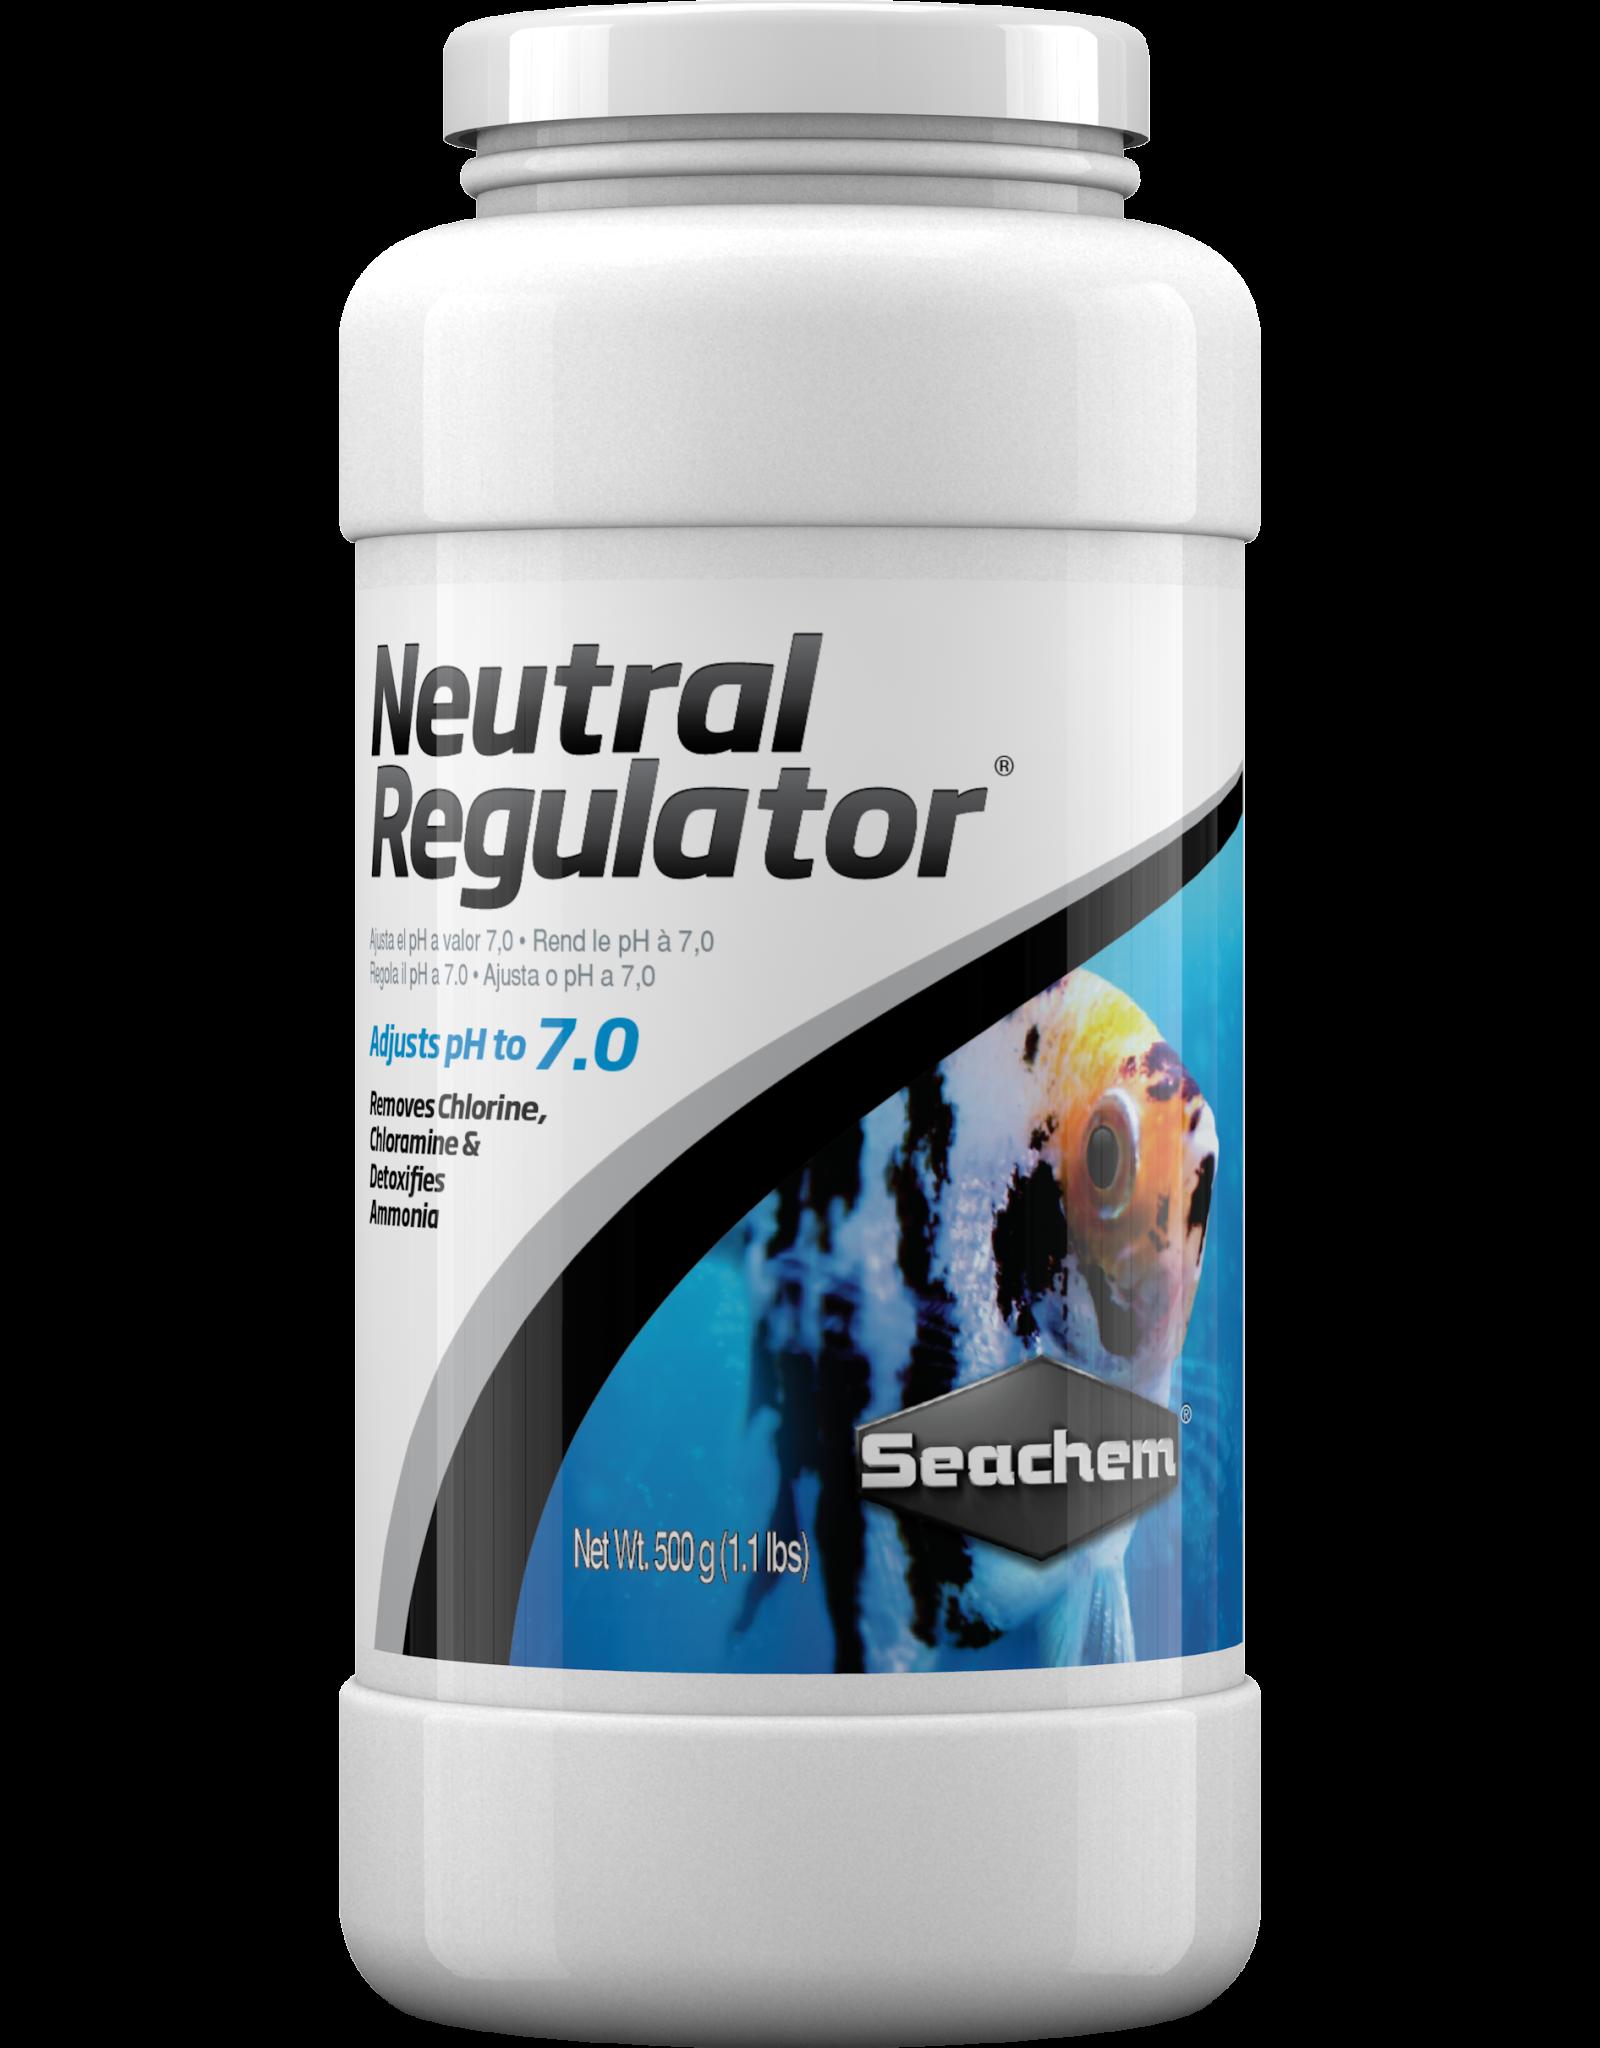 Seachem SEACHEM Neutral Regulator